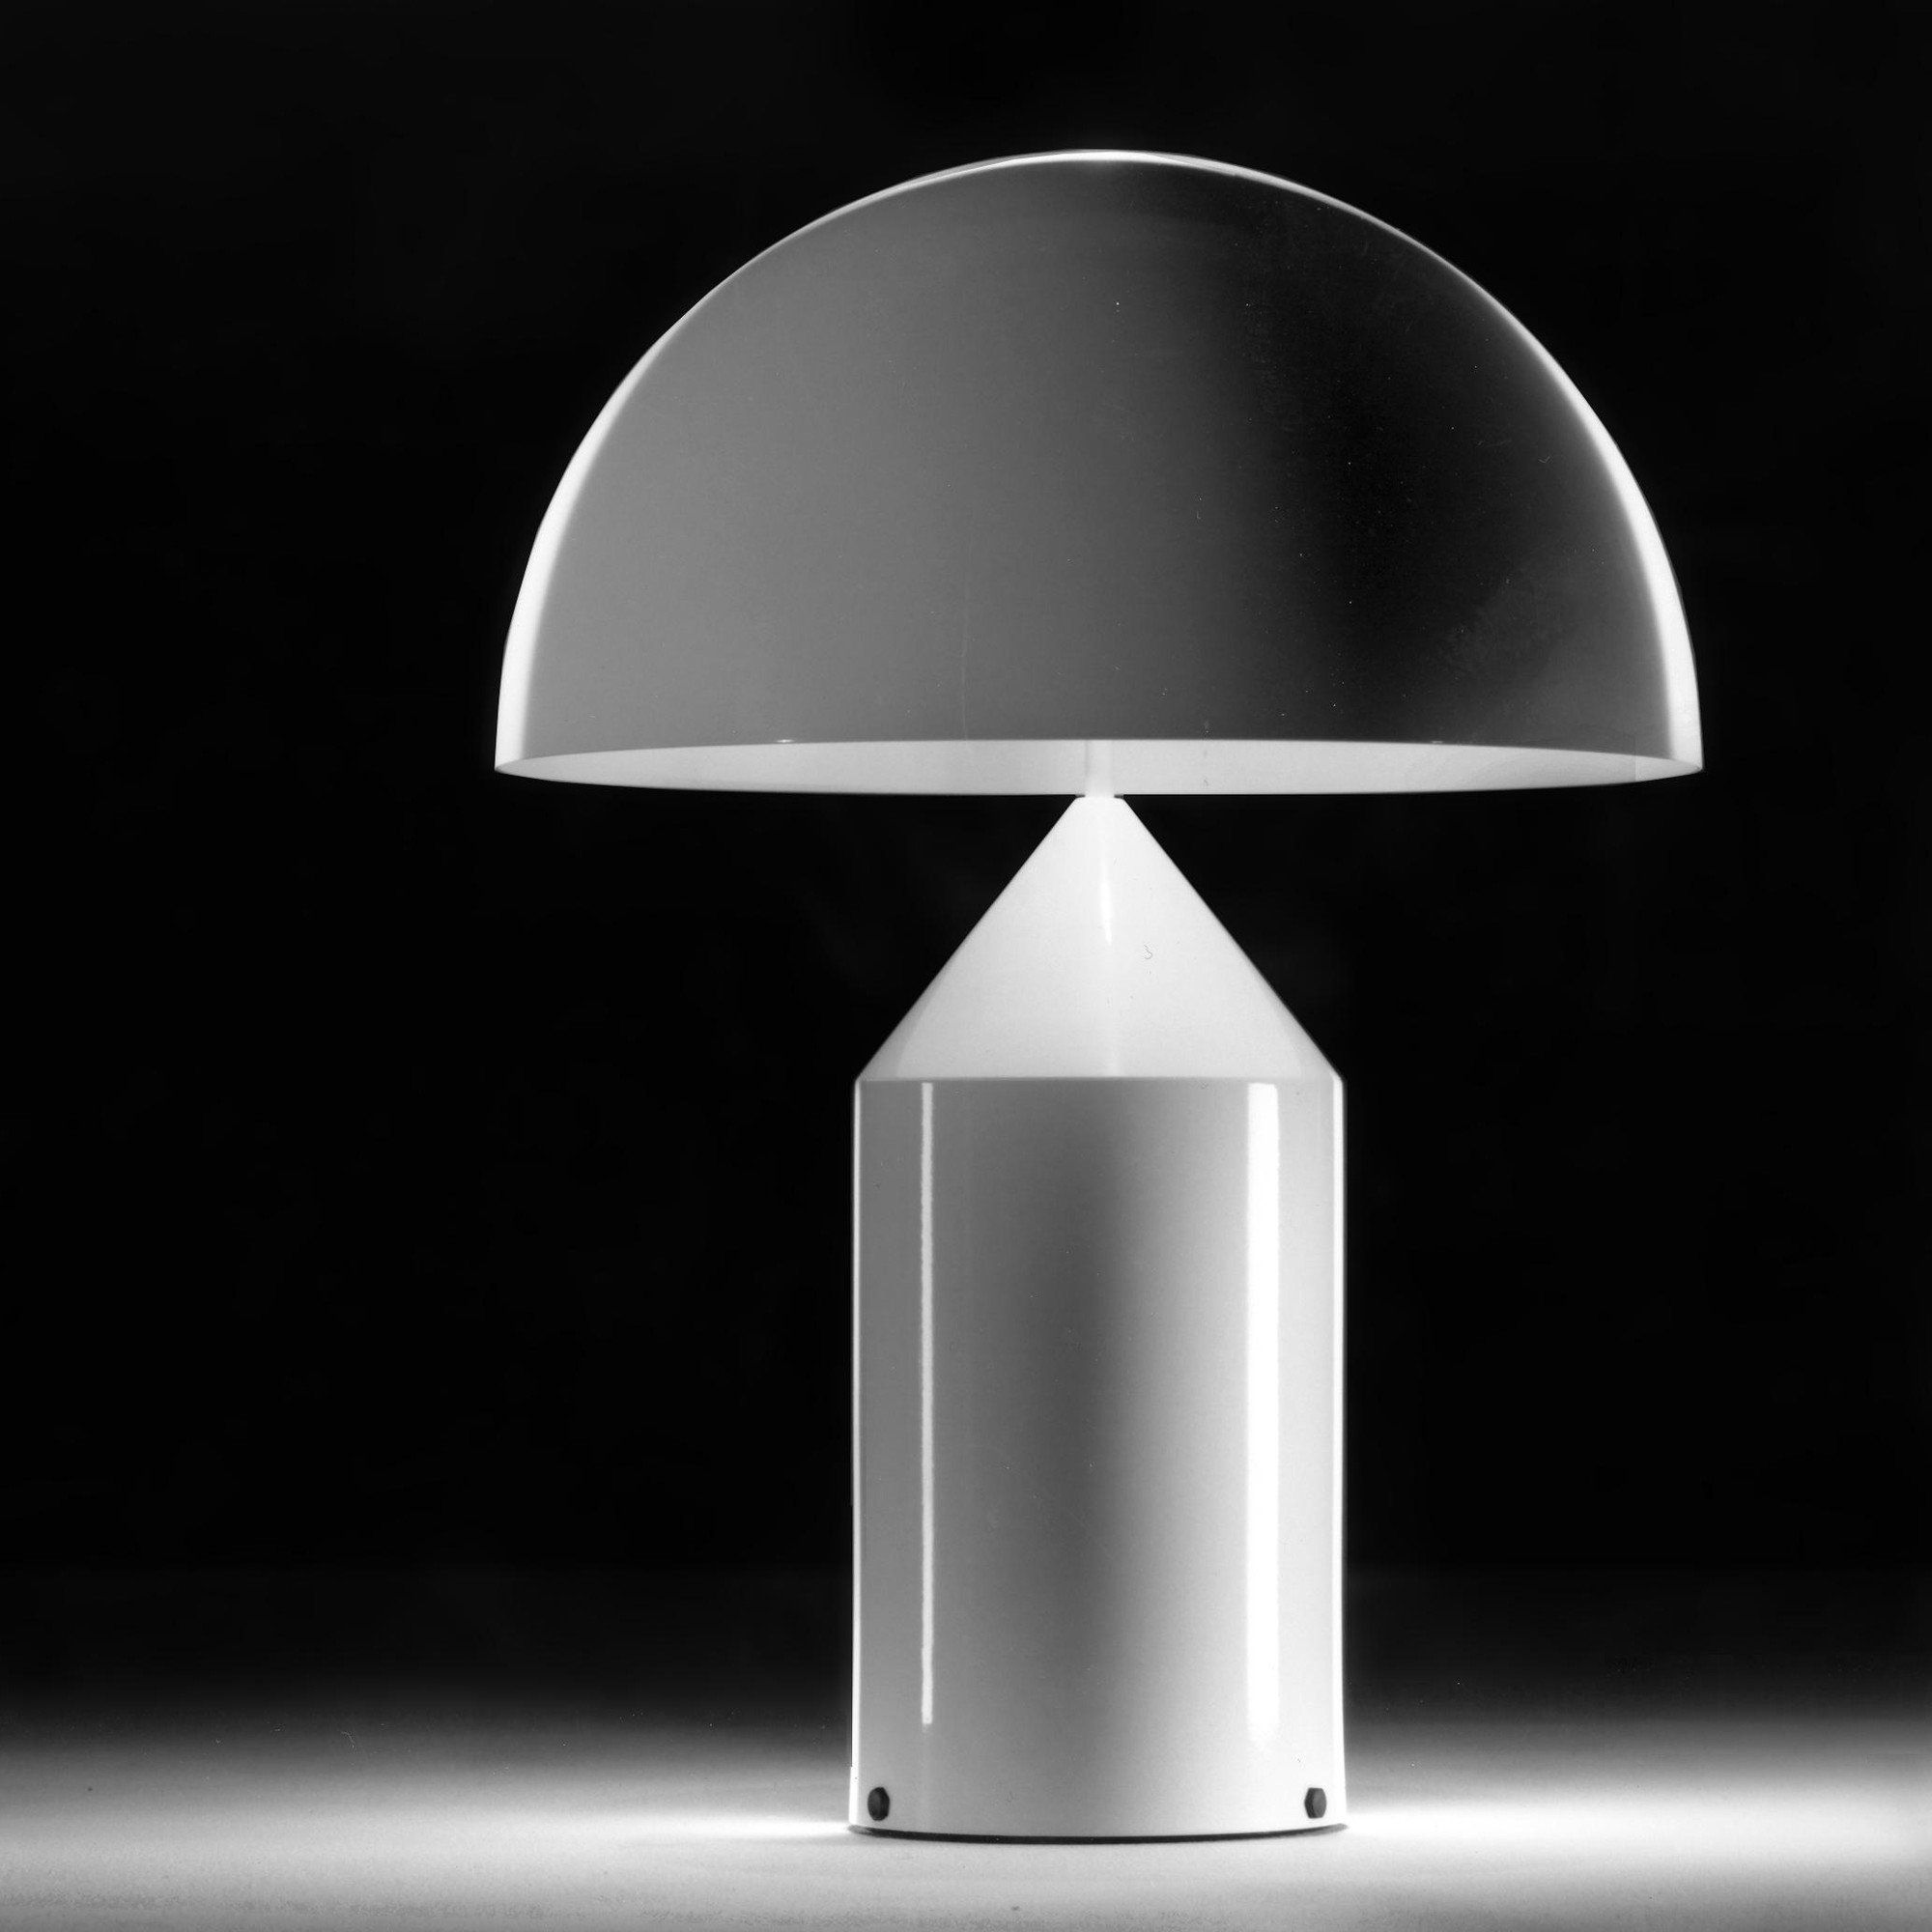 Atollo   Lampe de table blanc en 2020   Lampe de table blanche, Lampes de table et Table blanche